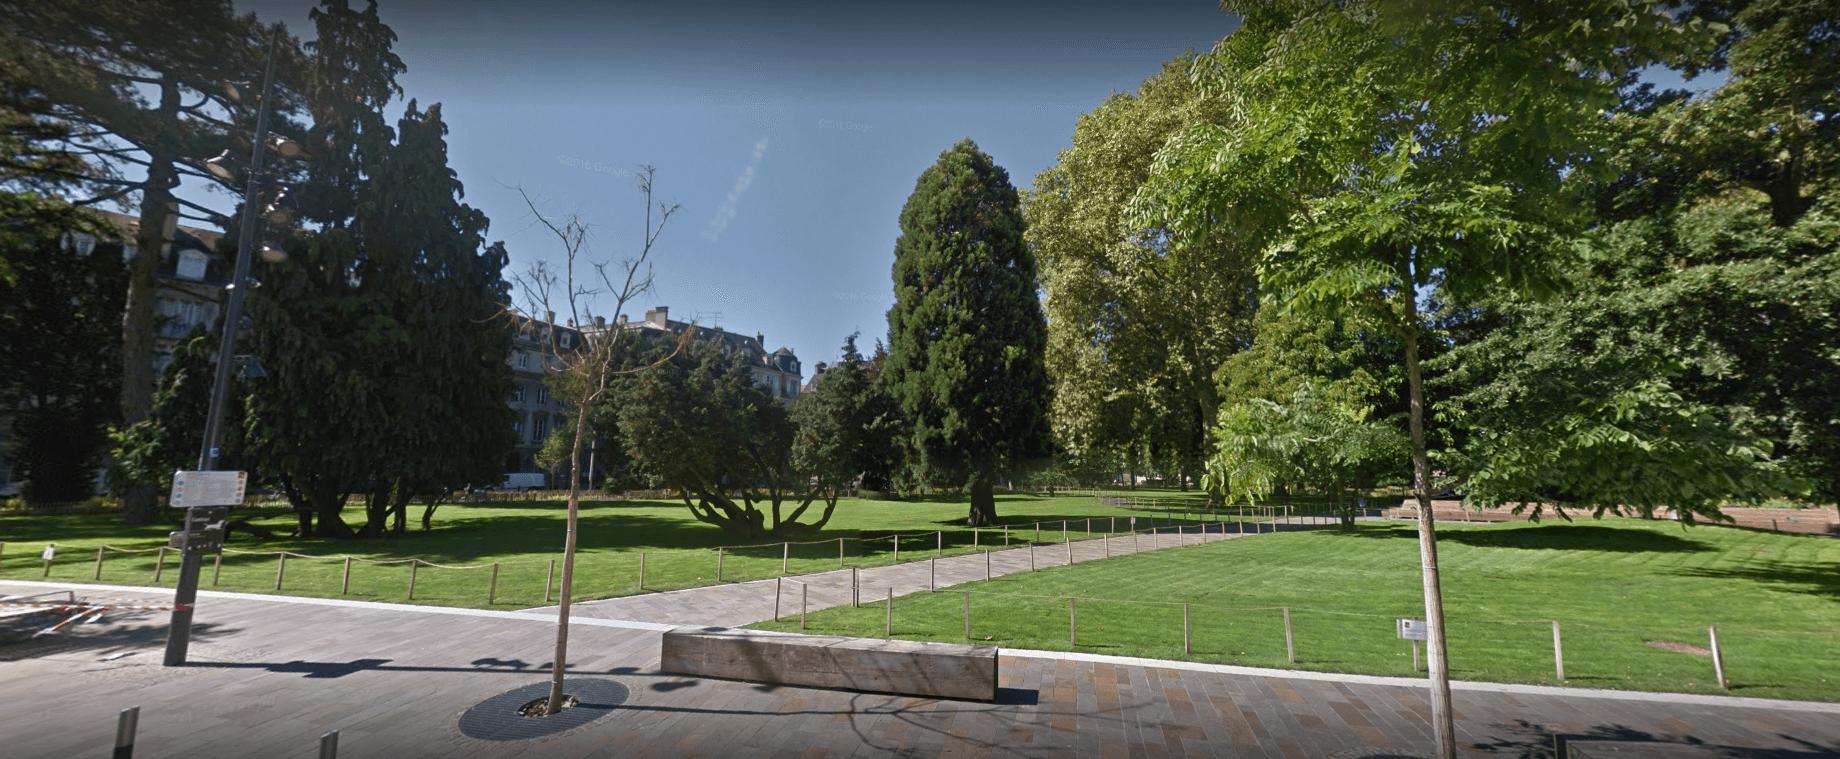 Mulhouse – Parc Steinbach